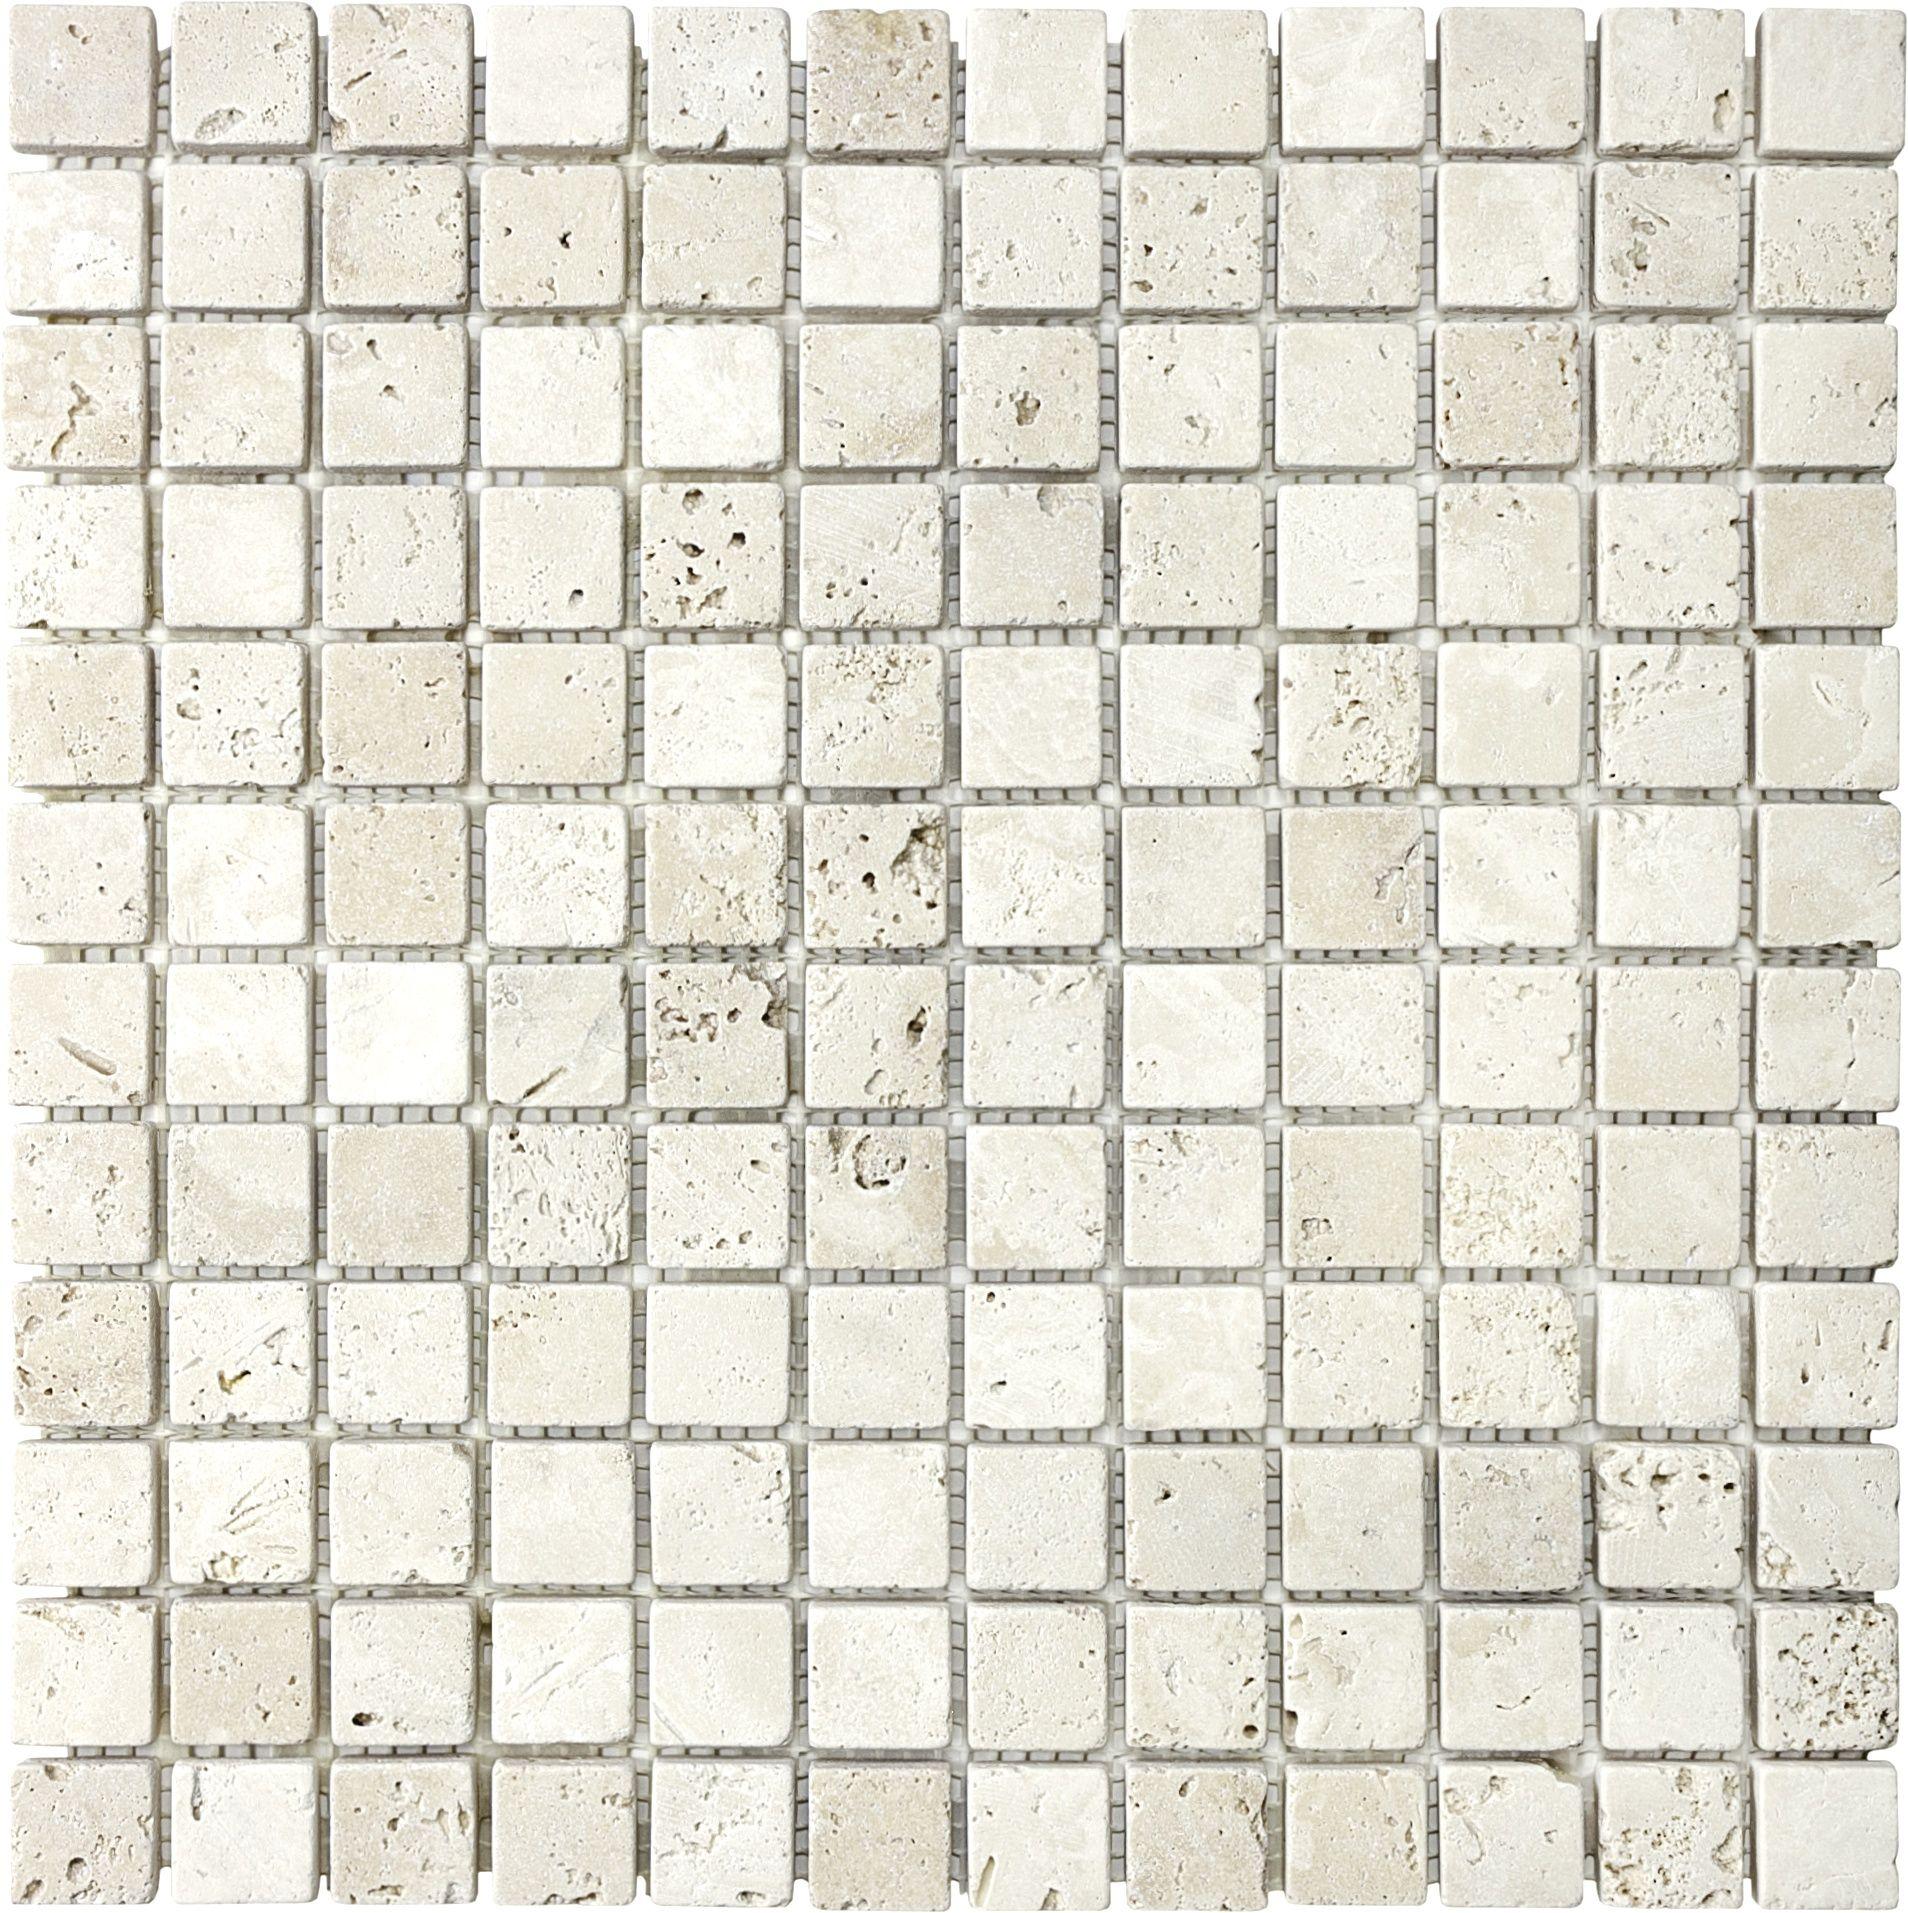 76 013 1 Quot X1 Quot Tumbled Ivory Travertine Mosaics Travertine